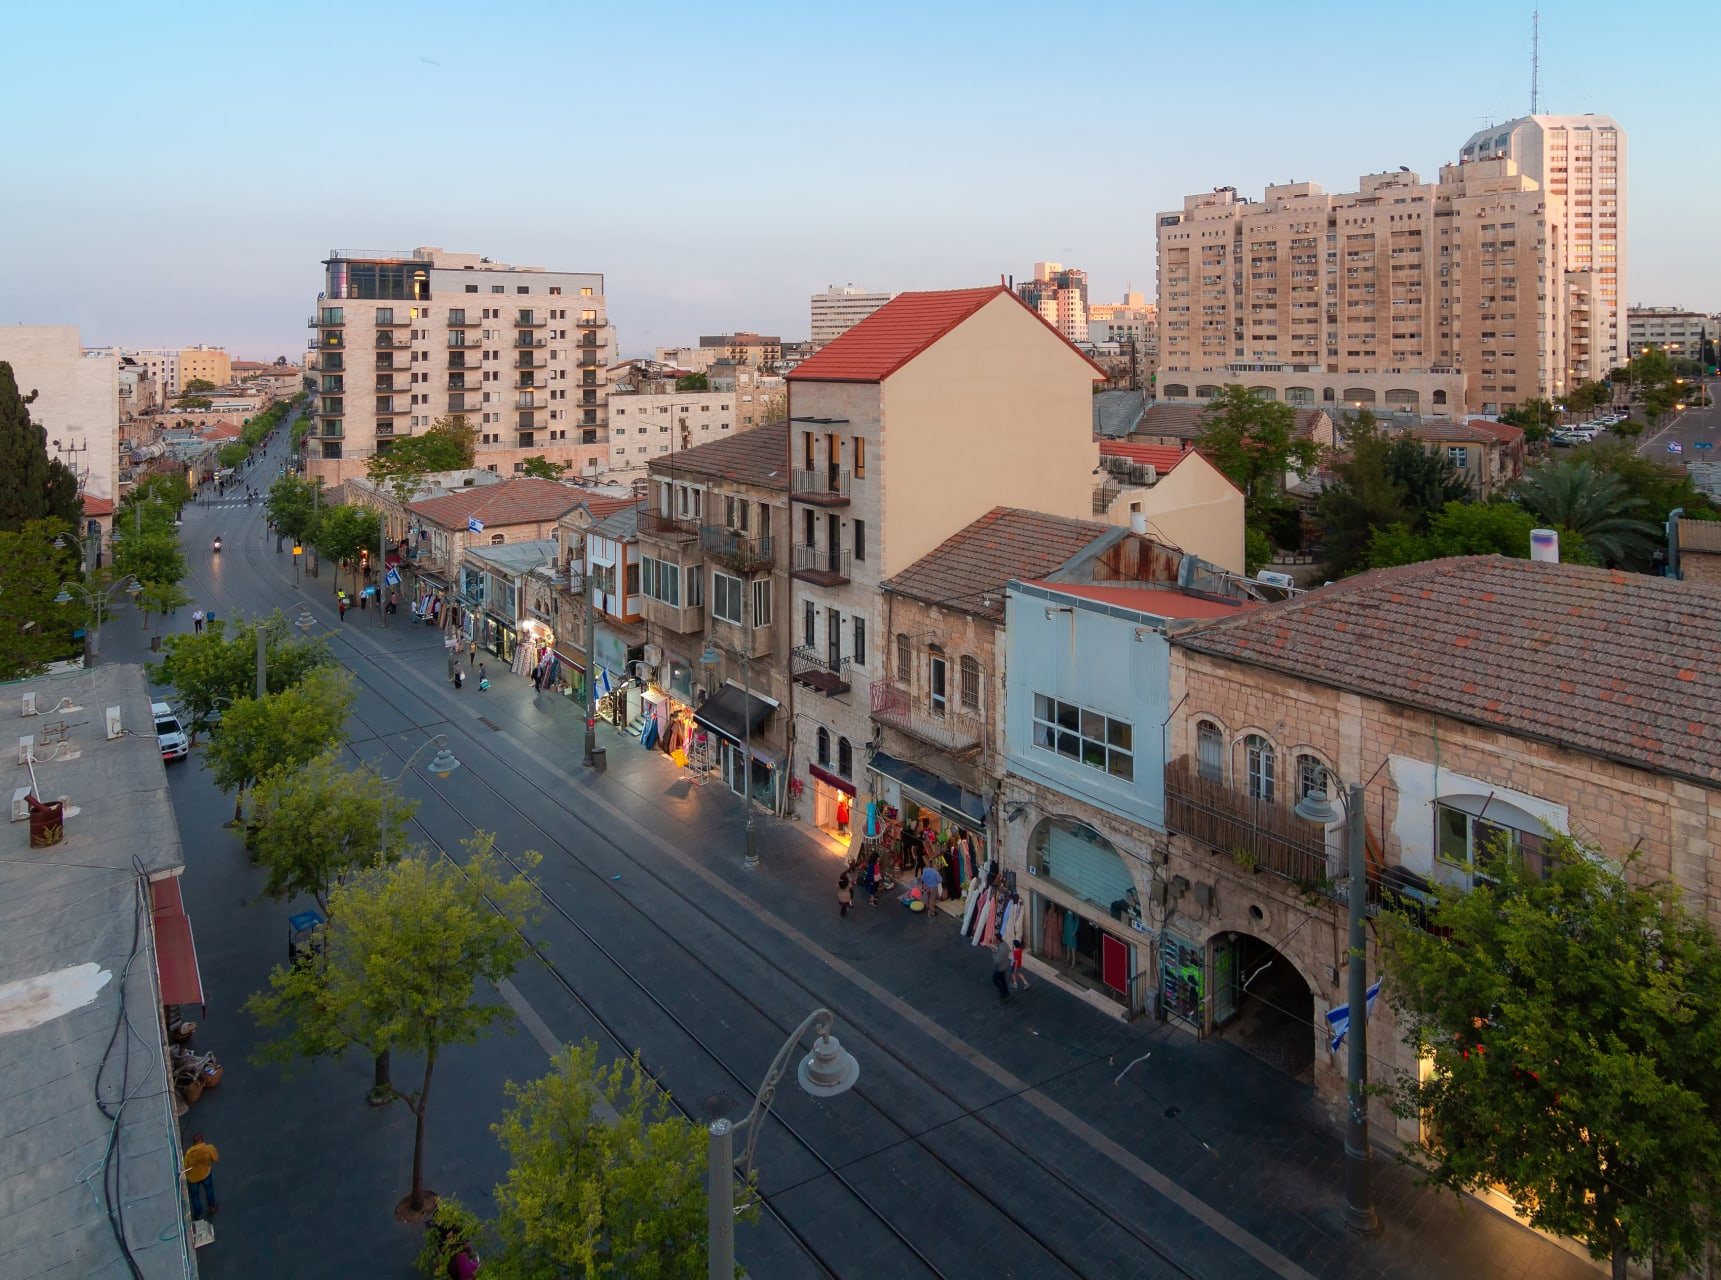 Jerusalem - Ask me anything as we walk down Jaffa street